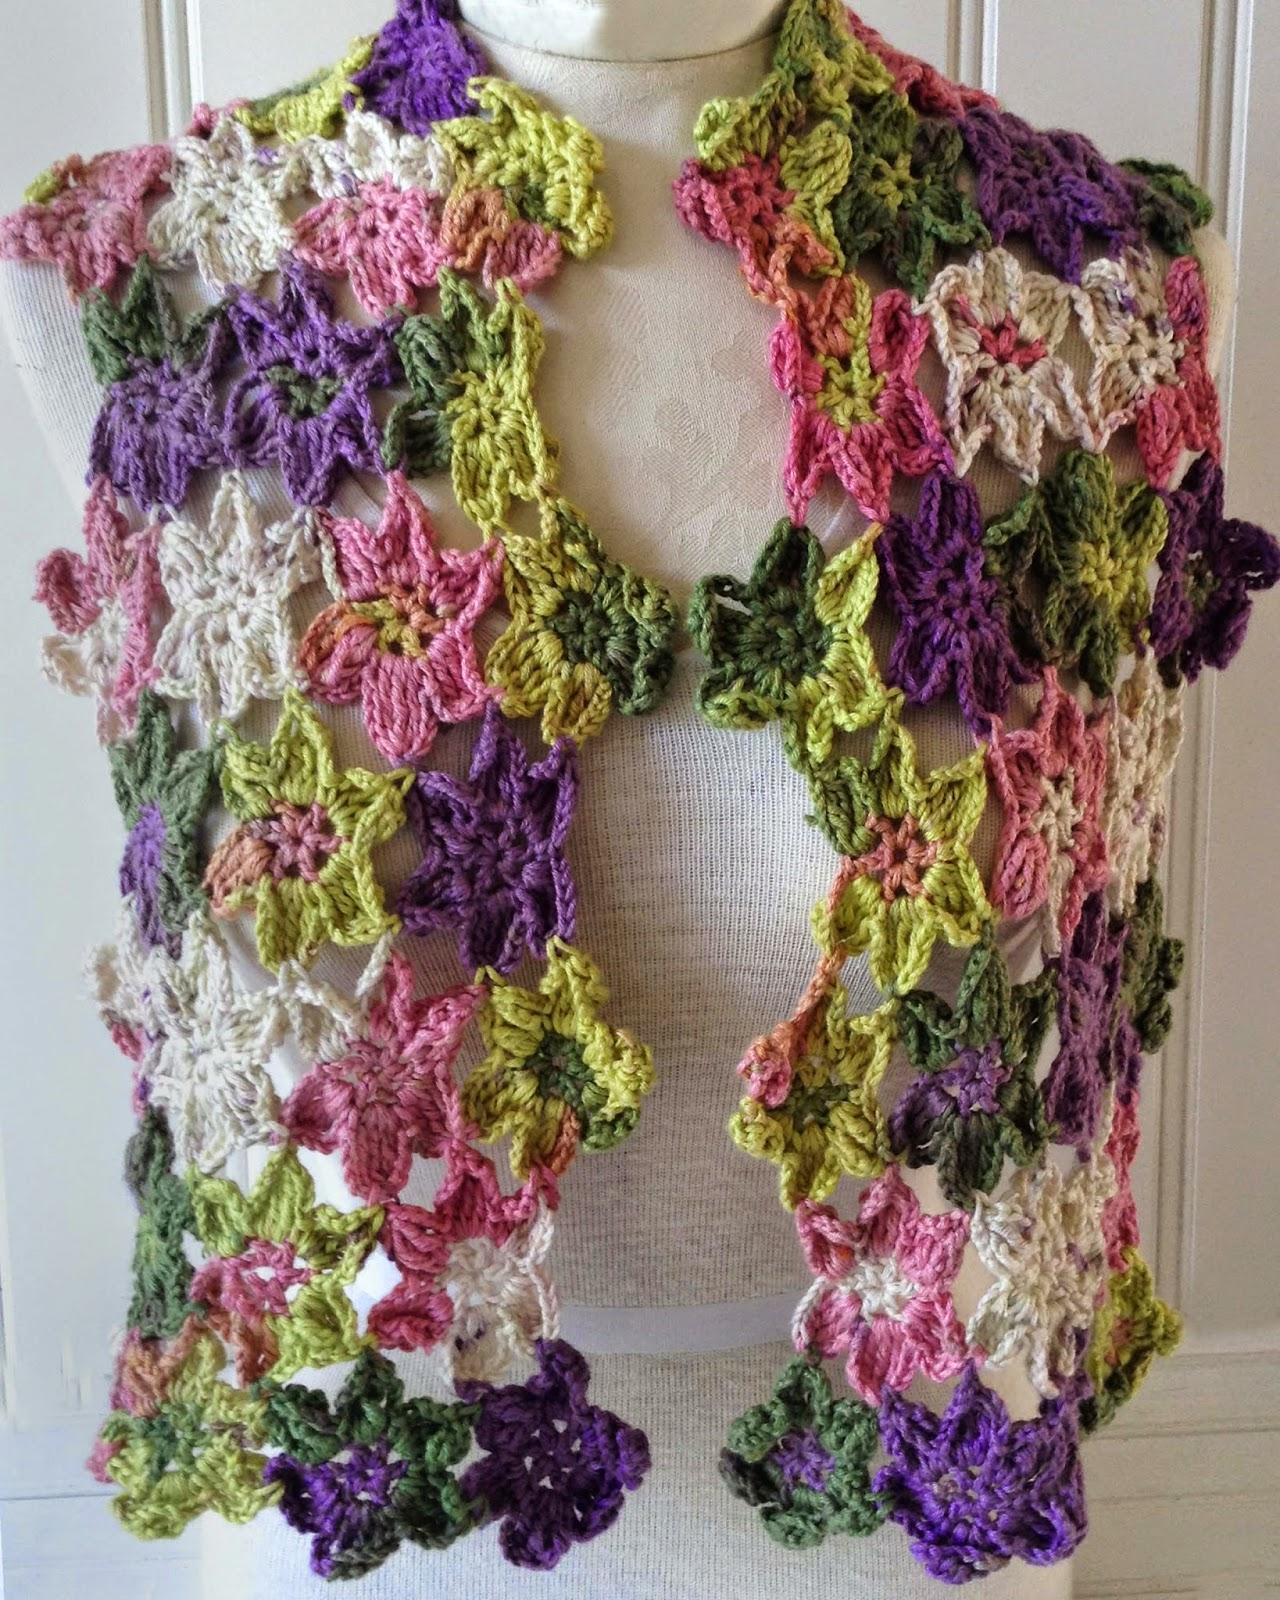 Crochet Floral Shawl Pattern : A Whole New Premier: Flower Fall Shawl